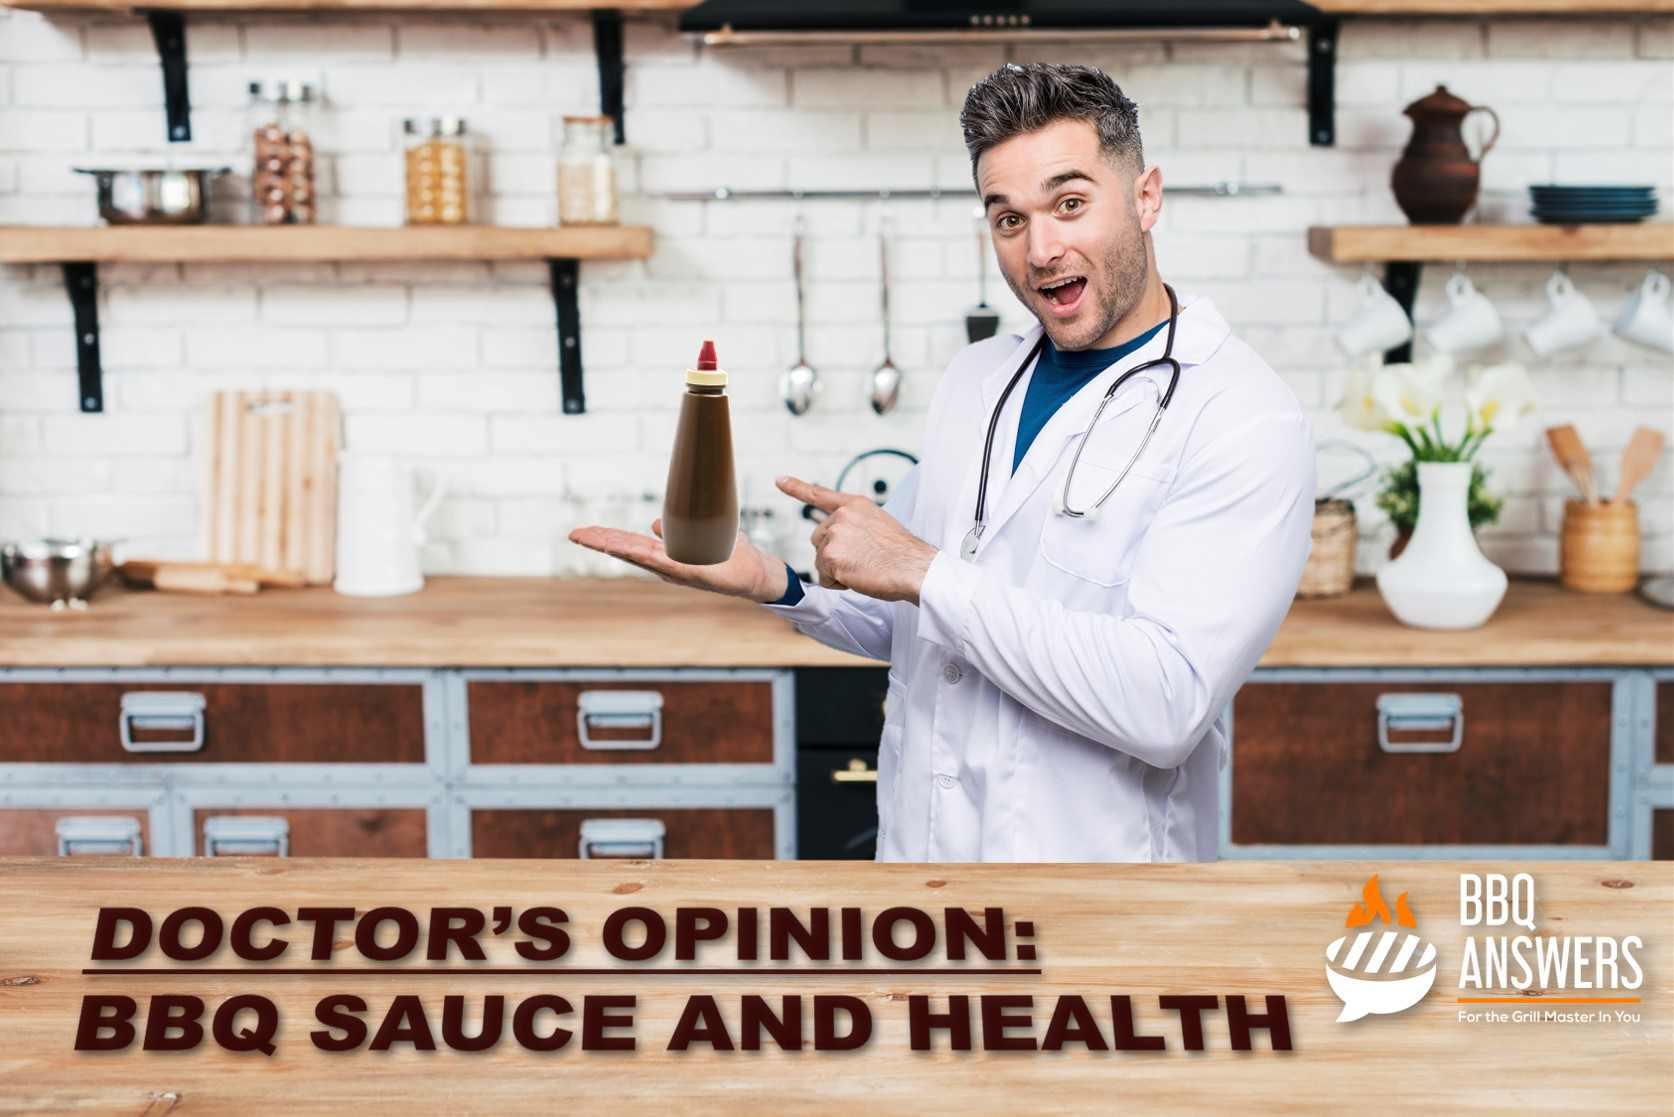 BBQ SAUCE Health Complications – Symptoms, Causes, & Remedies